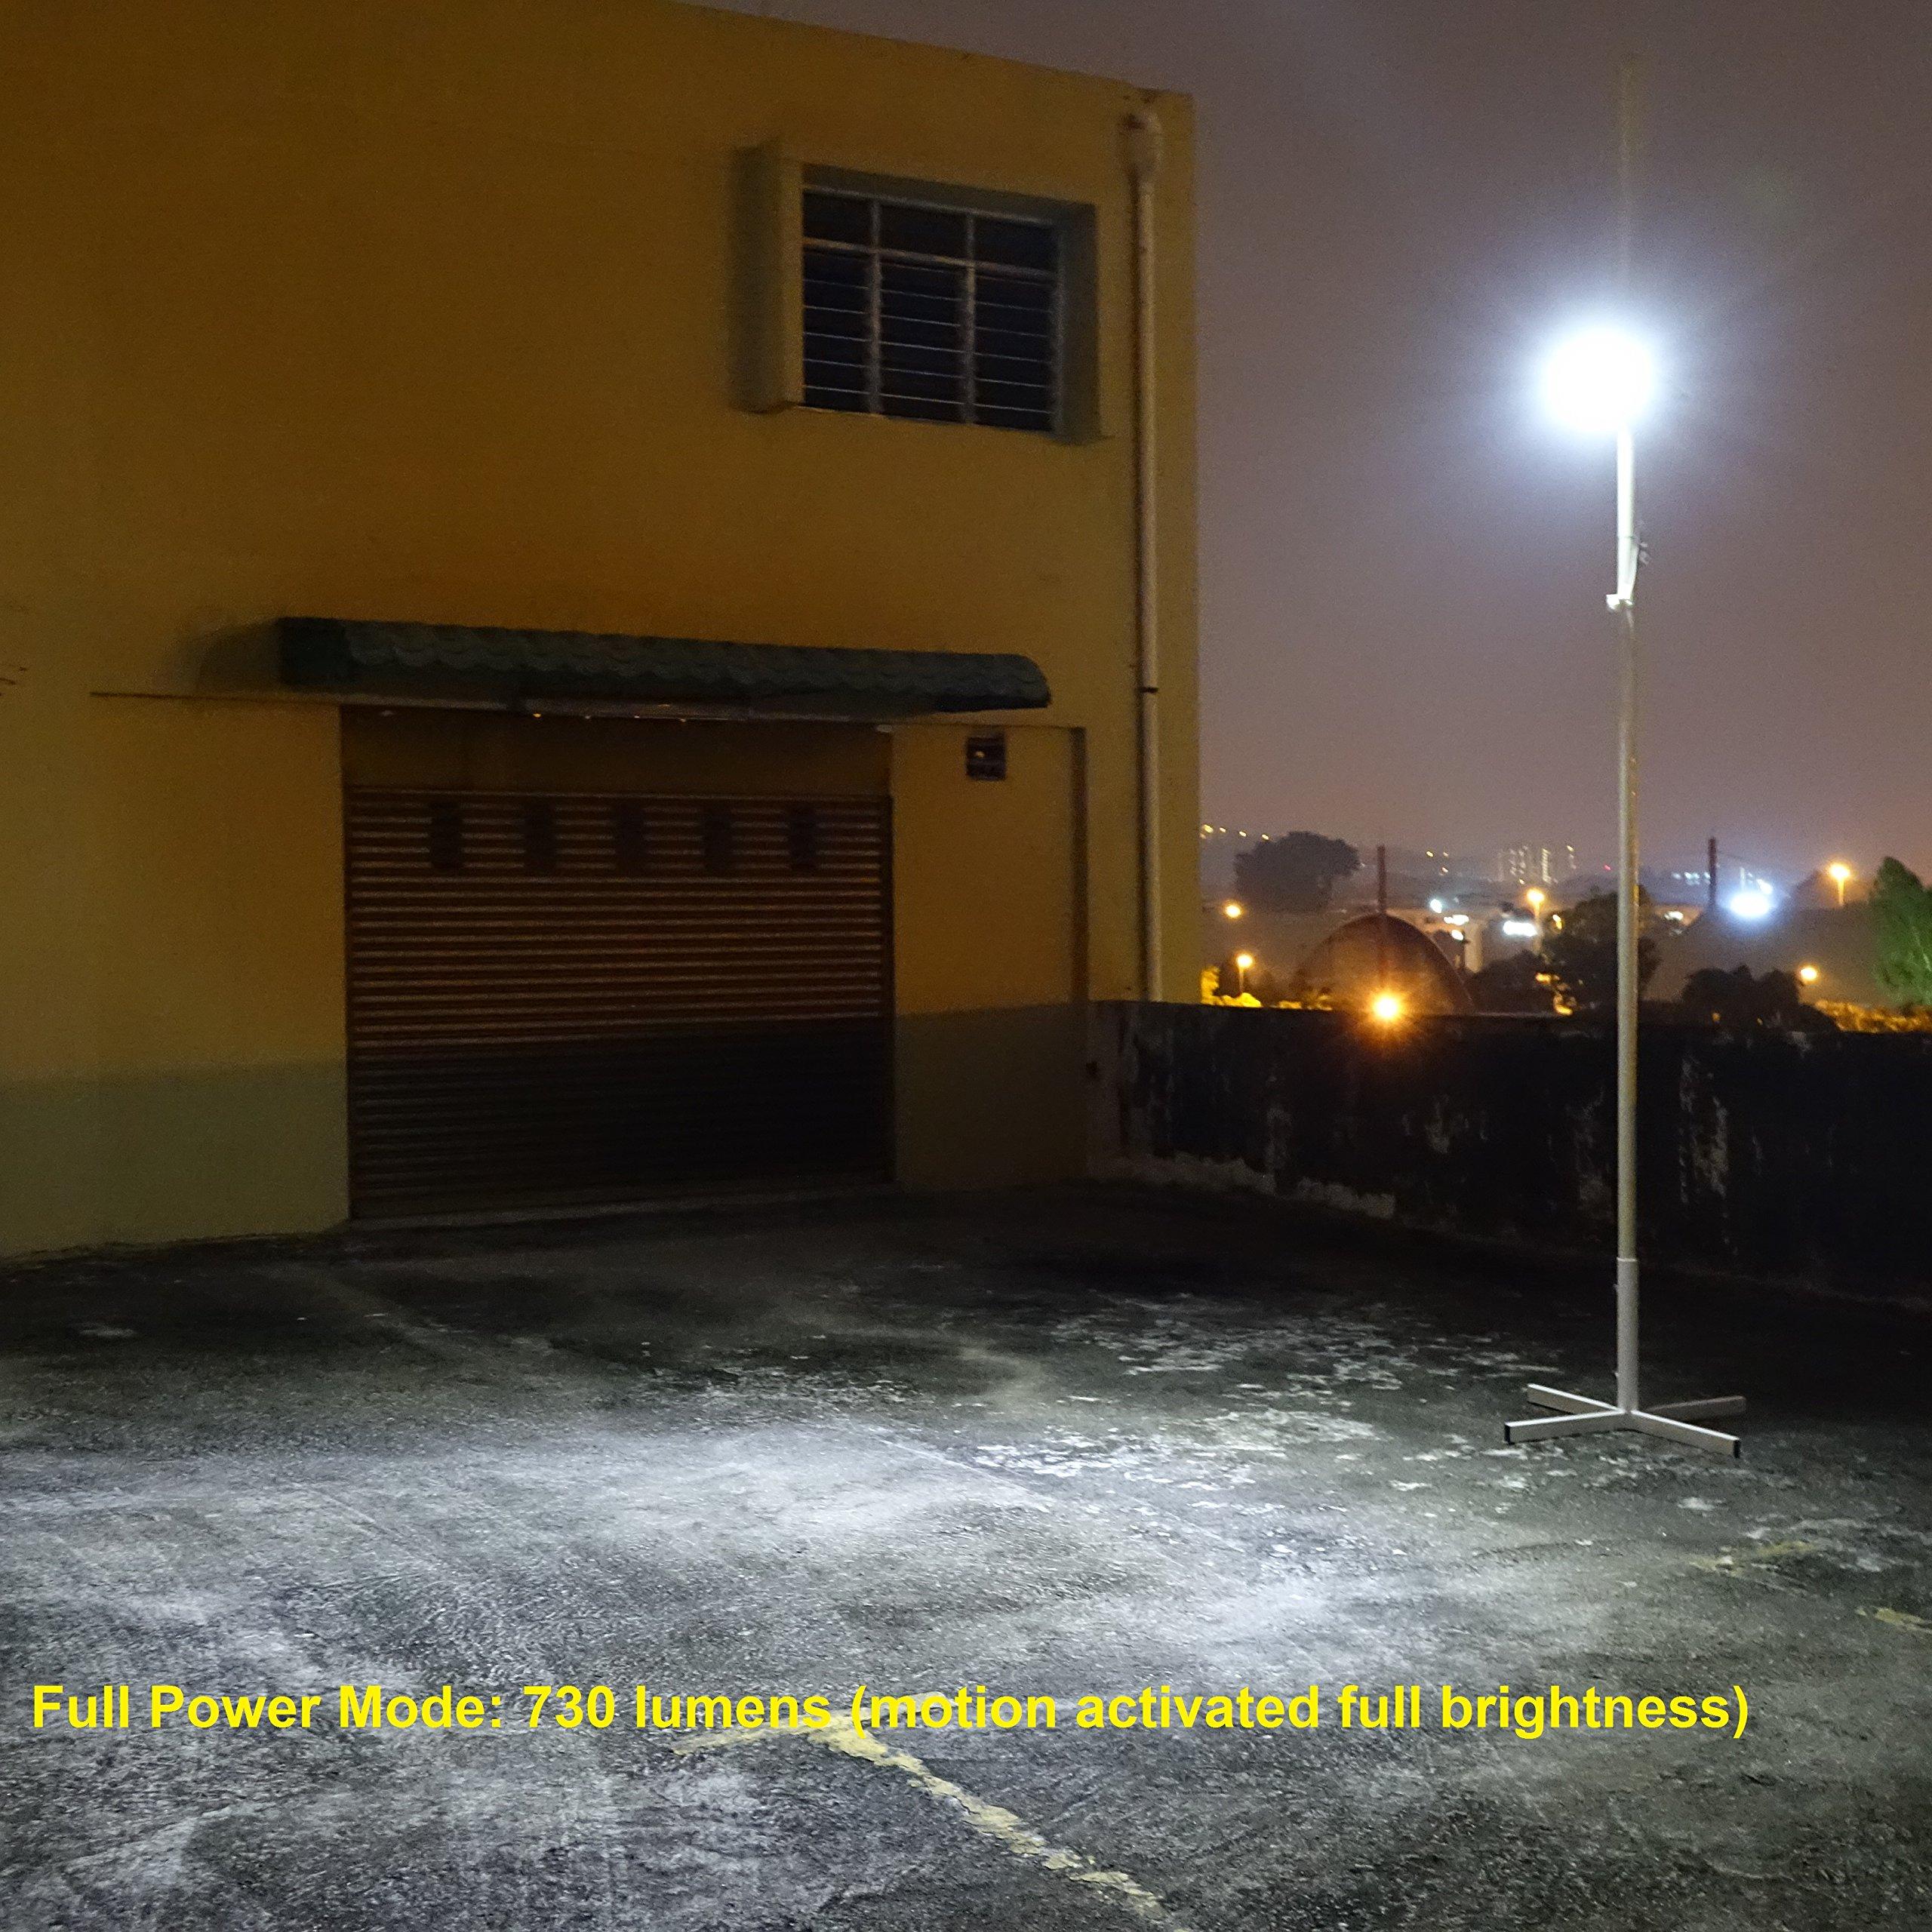 Road Signs Regulatory Signs Waterproof Weatherproof IP65 Alpha 1200X Billboard Light //// Security Light //// Flood Light for Warehouse